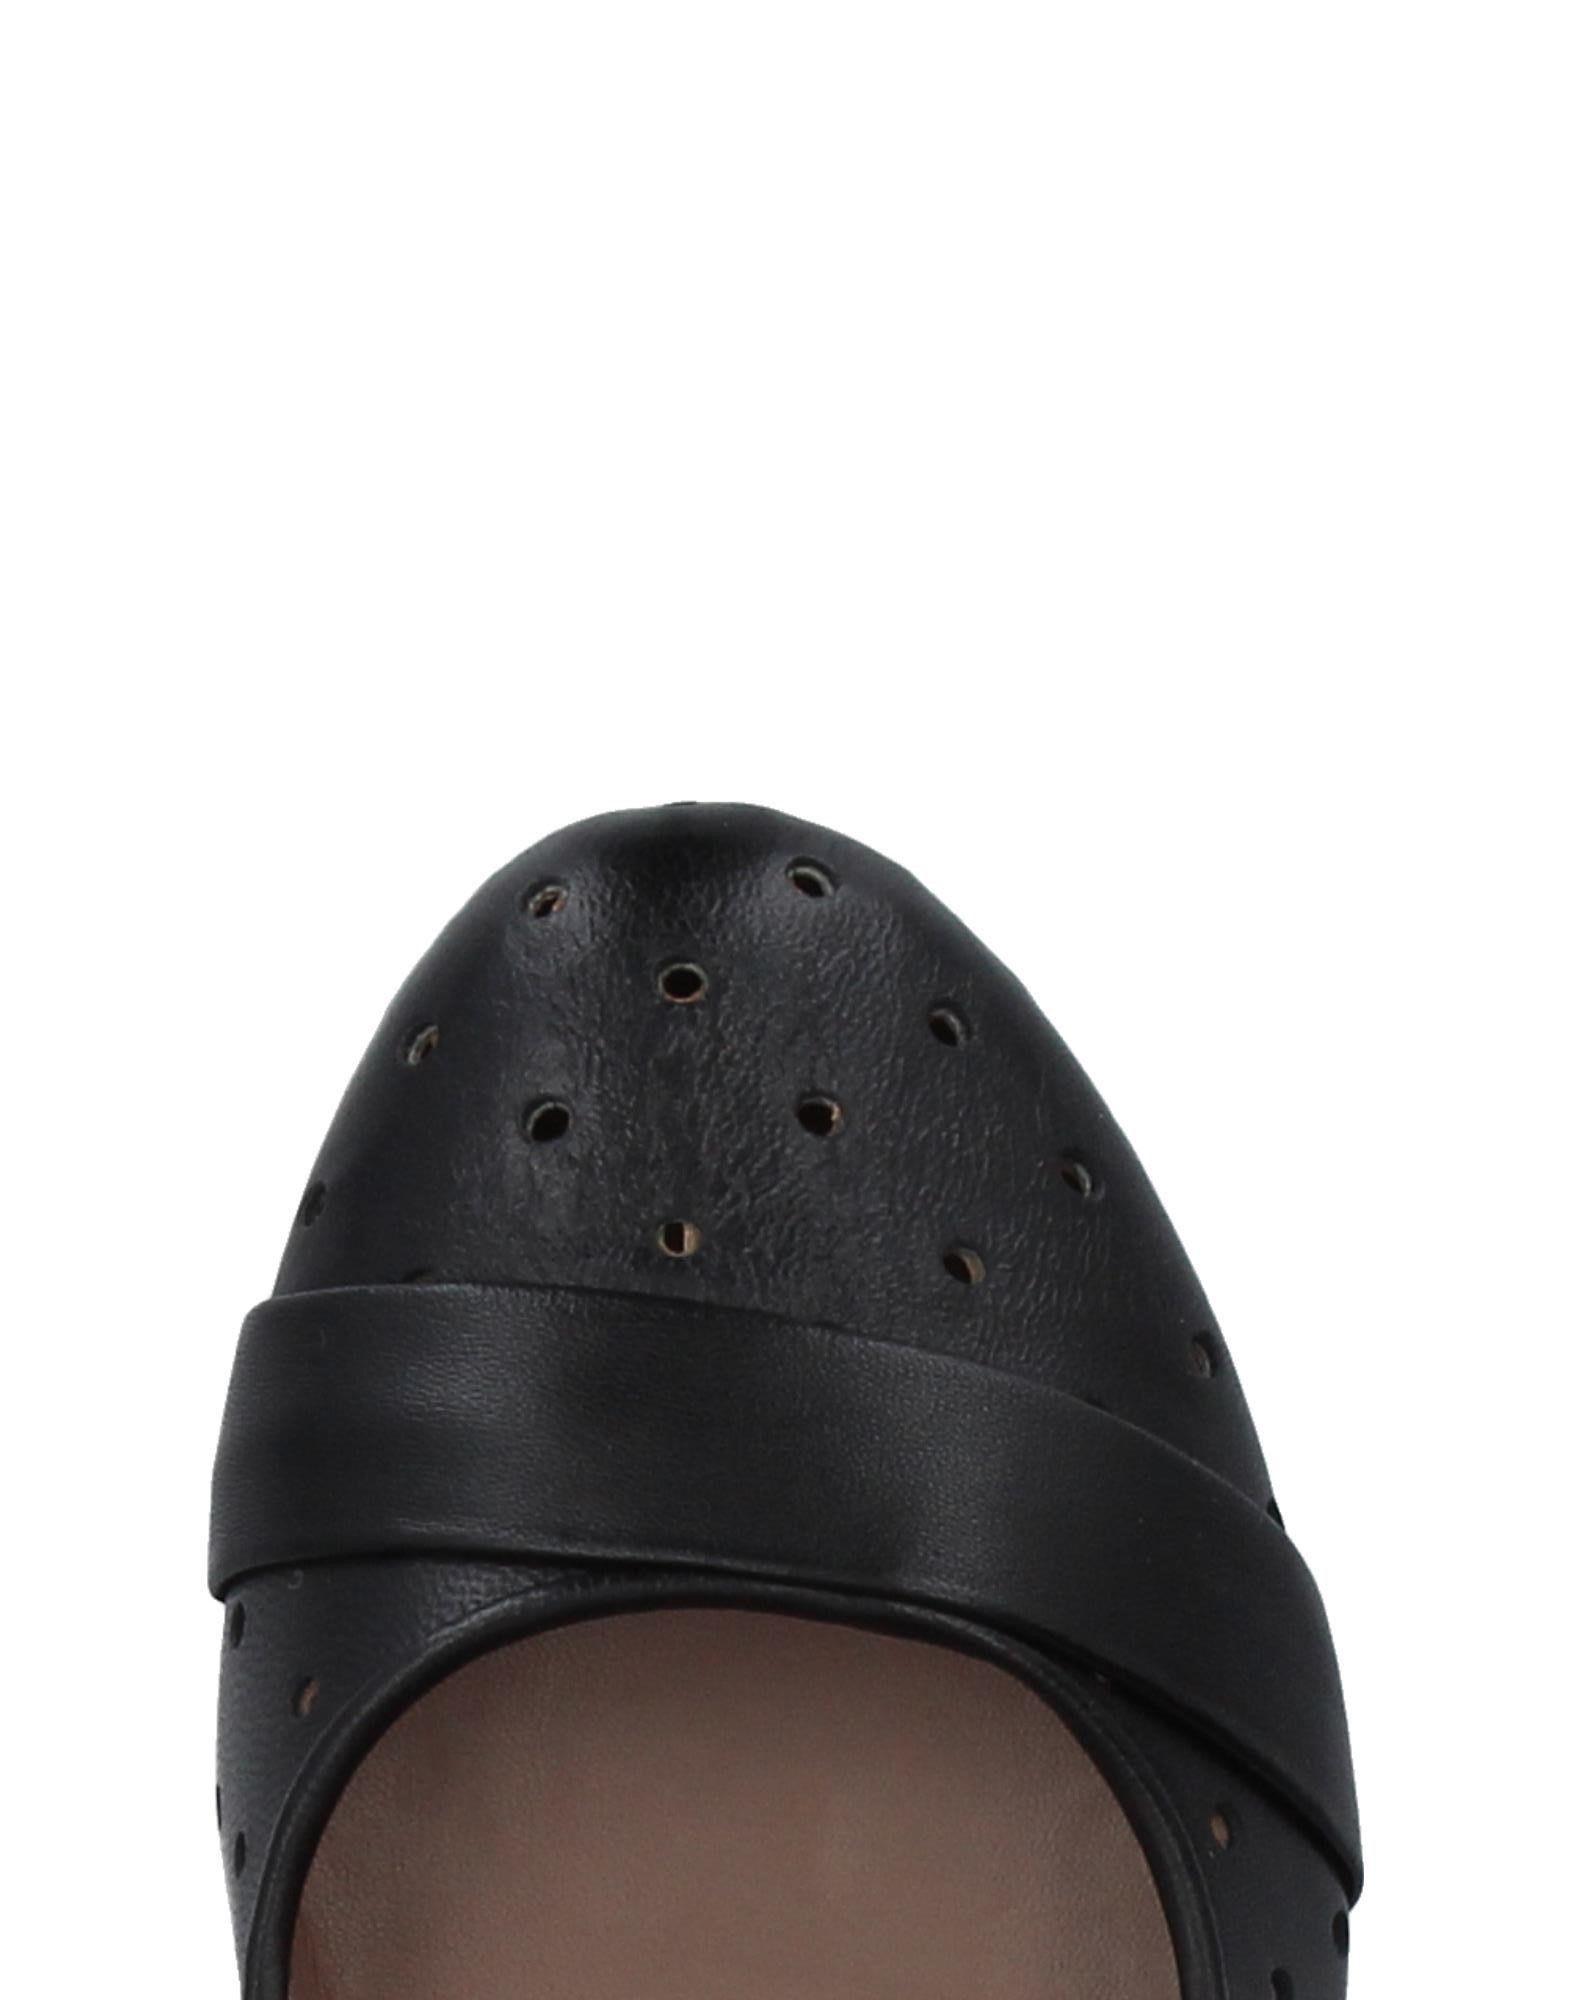 Audley Pumps Damen  11132577VI Gute Qualität beliebte Schuhe